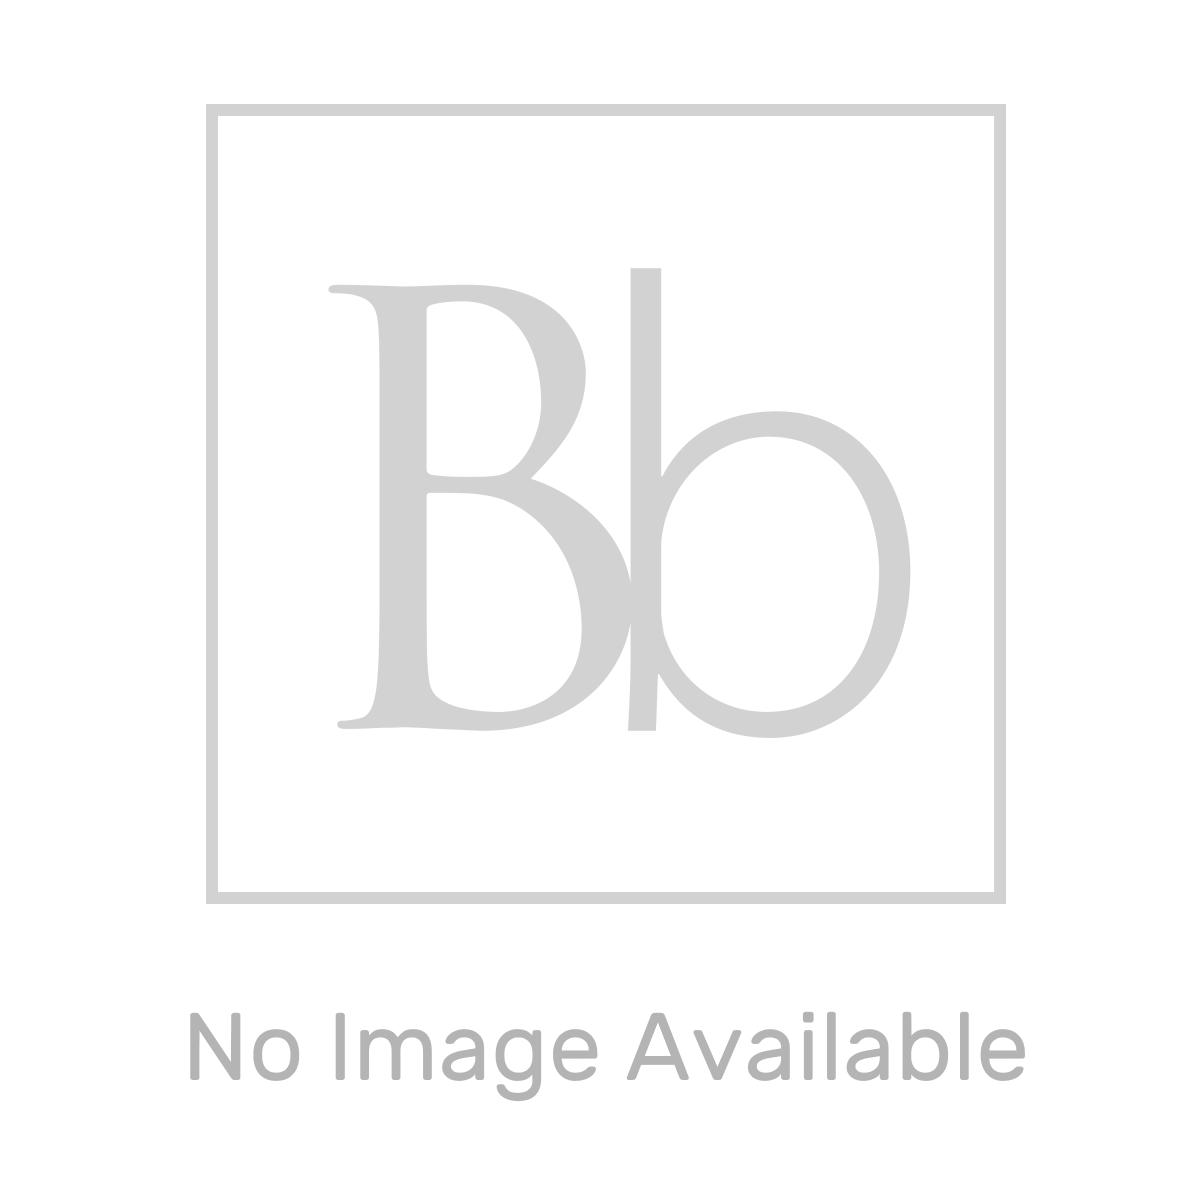 Croydex White Textile Shower Curtain With Hygiene 'N' Clean